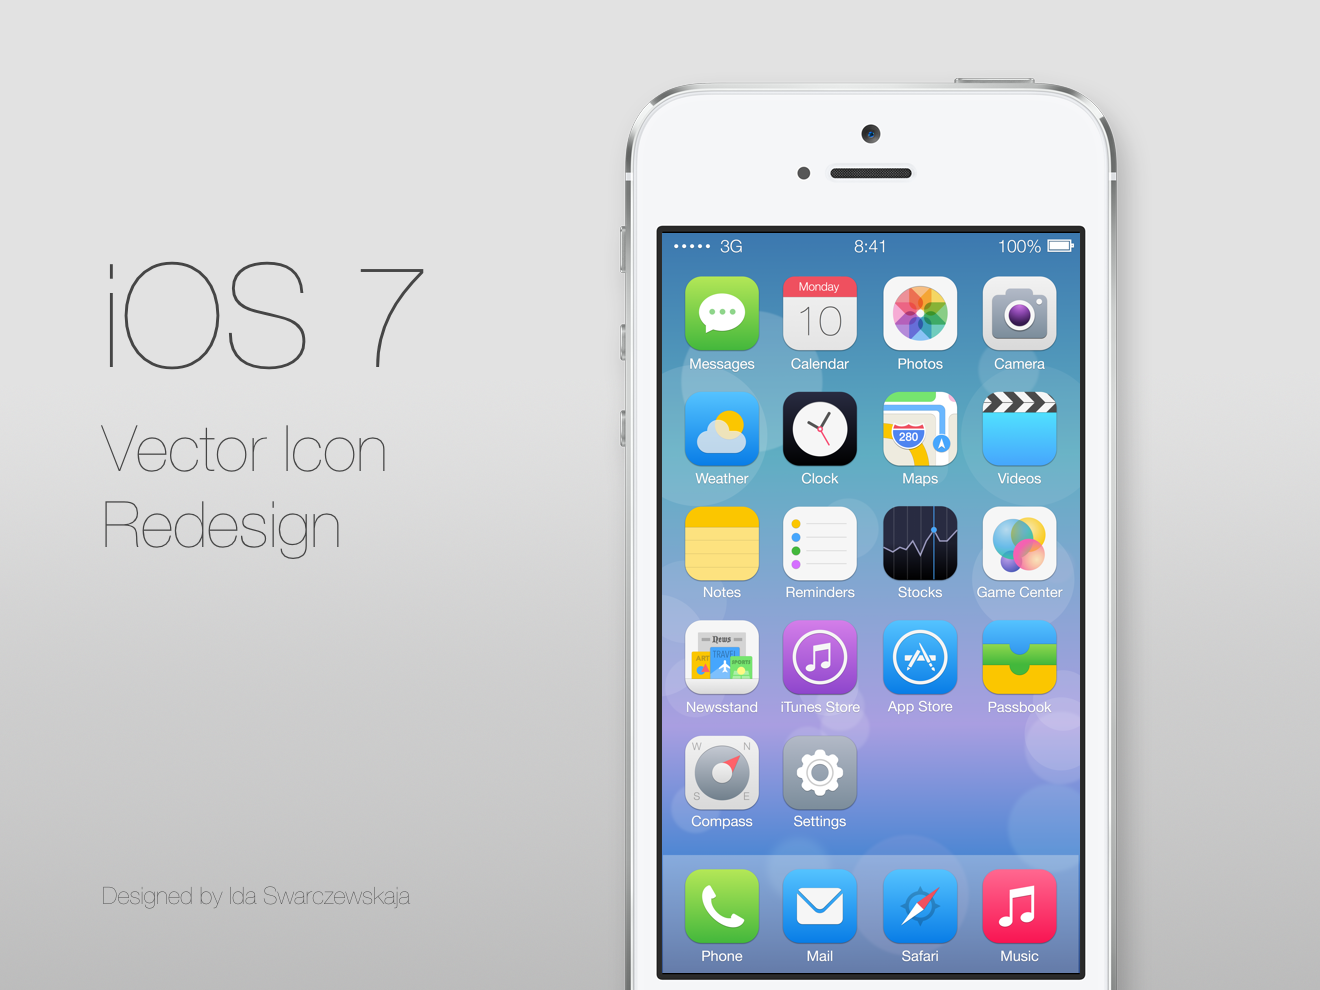 ios7_icon_redesign_by_ida_swarczewskaja-1